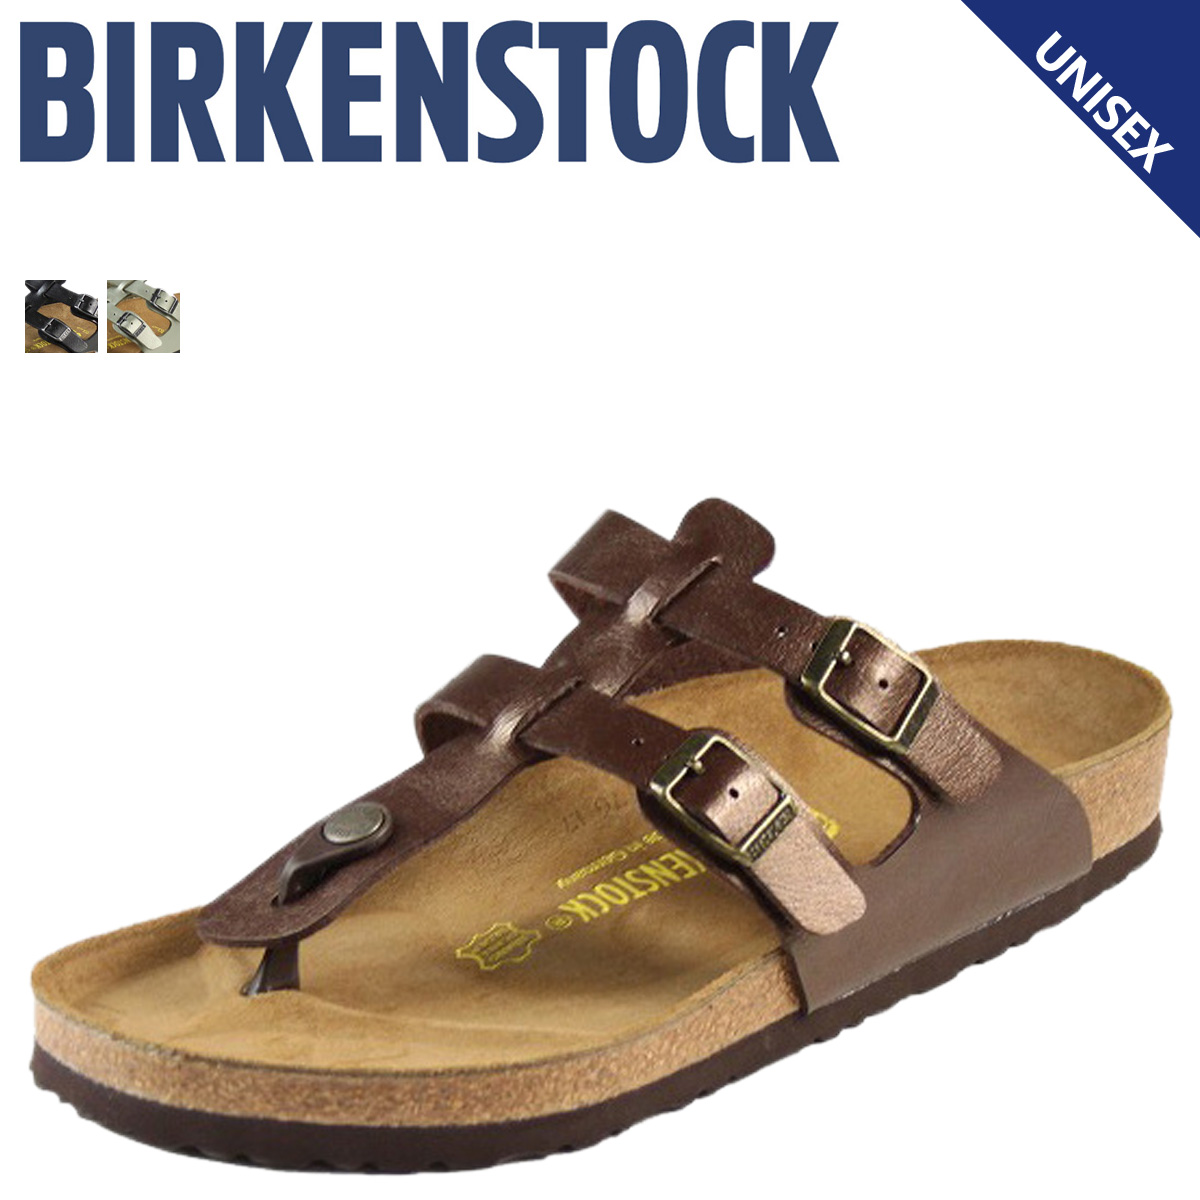 a3160800ccaf2 Birkenstock-BIRKENSTOCK Sparta SPARTA [normal width synthetic leather, 3  color Womens mens unisex ...